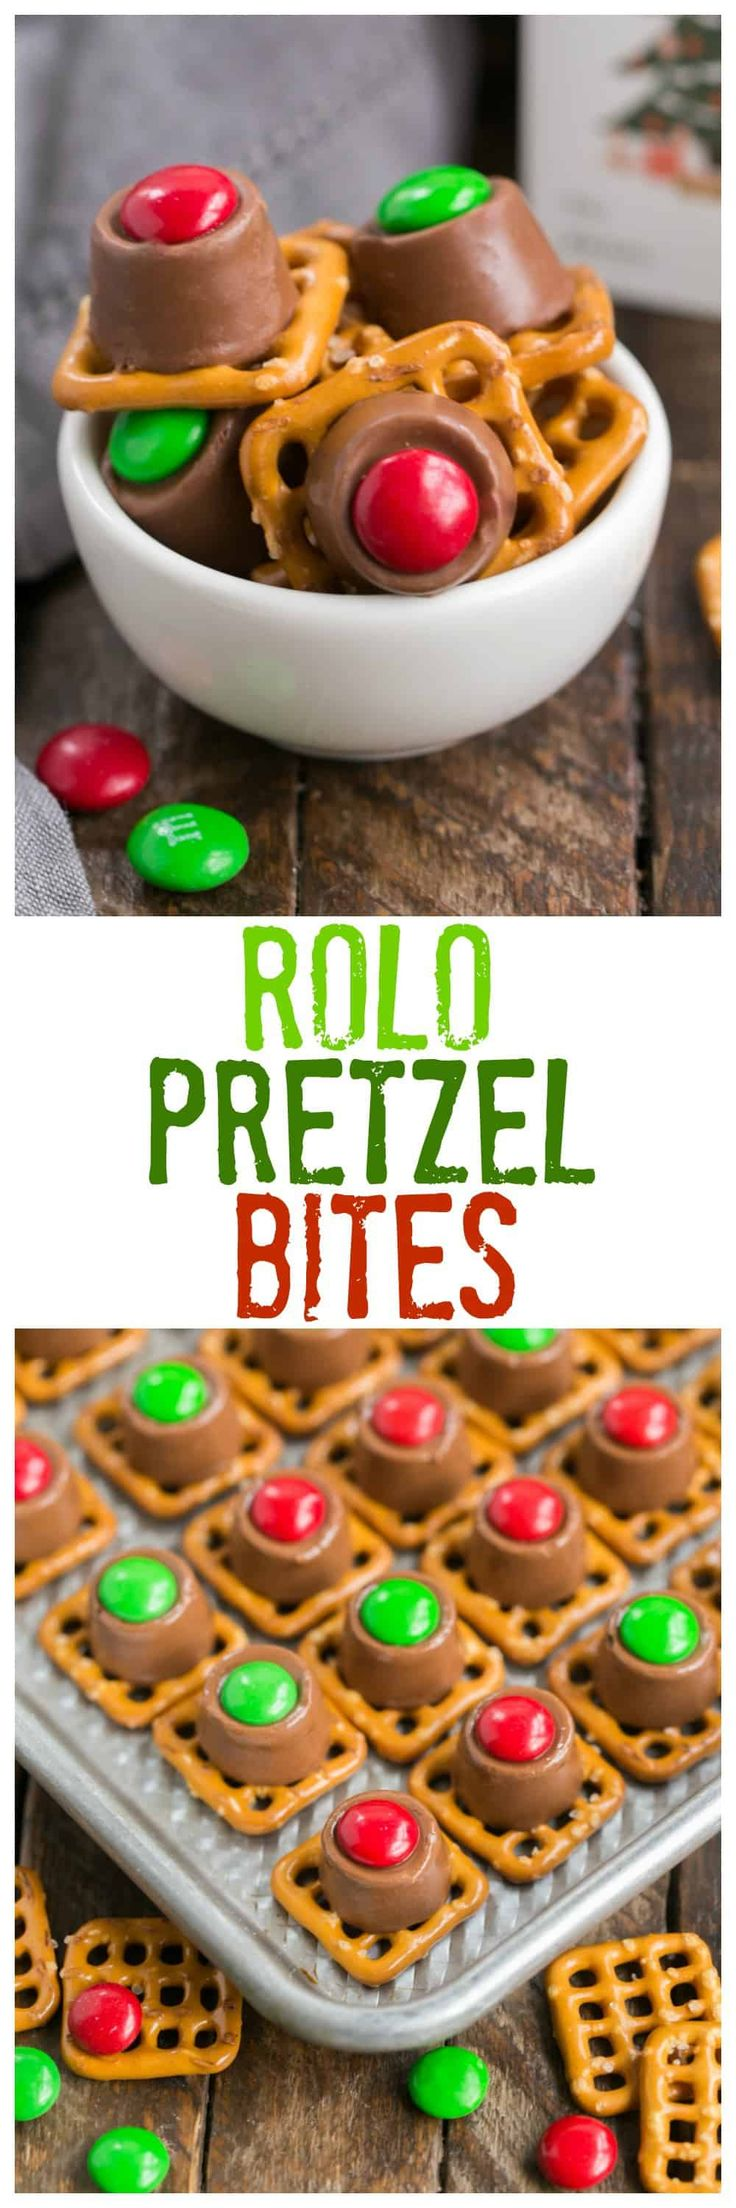 Rolo Pretzel Bites   A super easy, sweet and salty, chocolate, caramel and pretzel treat! #snacks #easyrecipes #pretzels